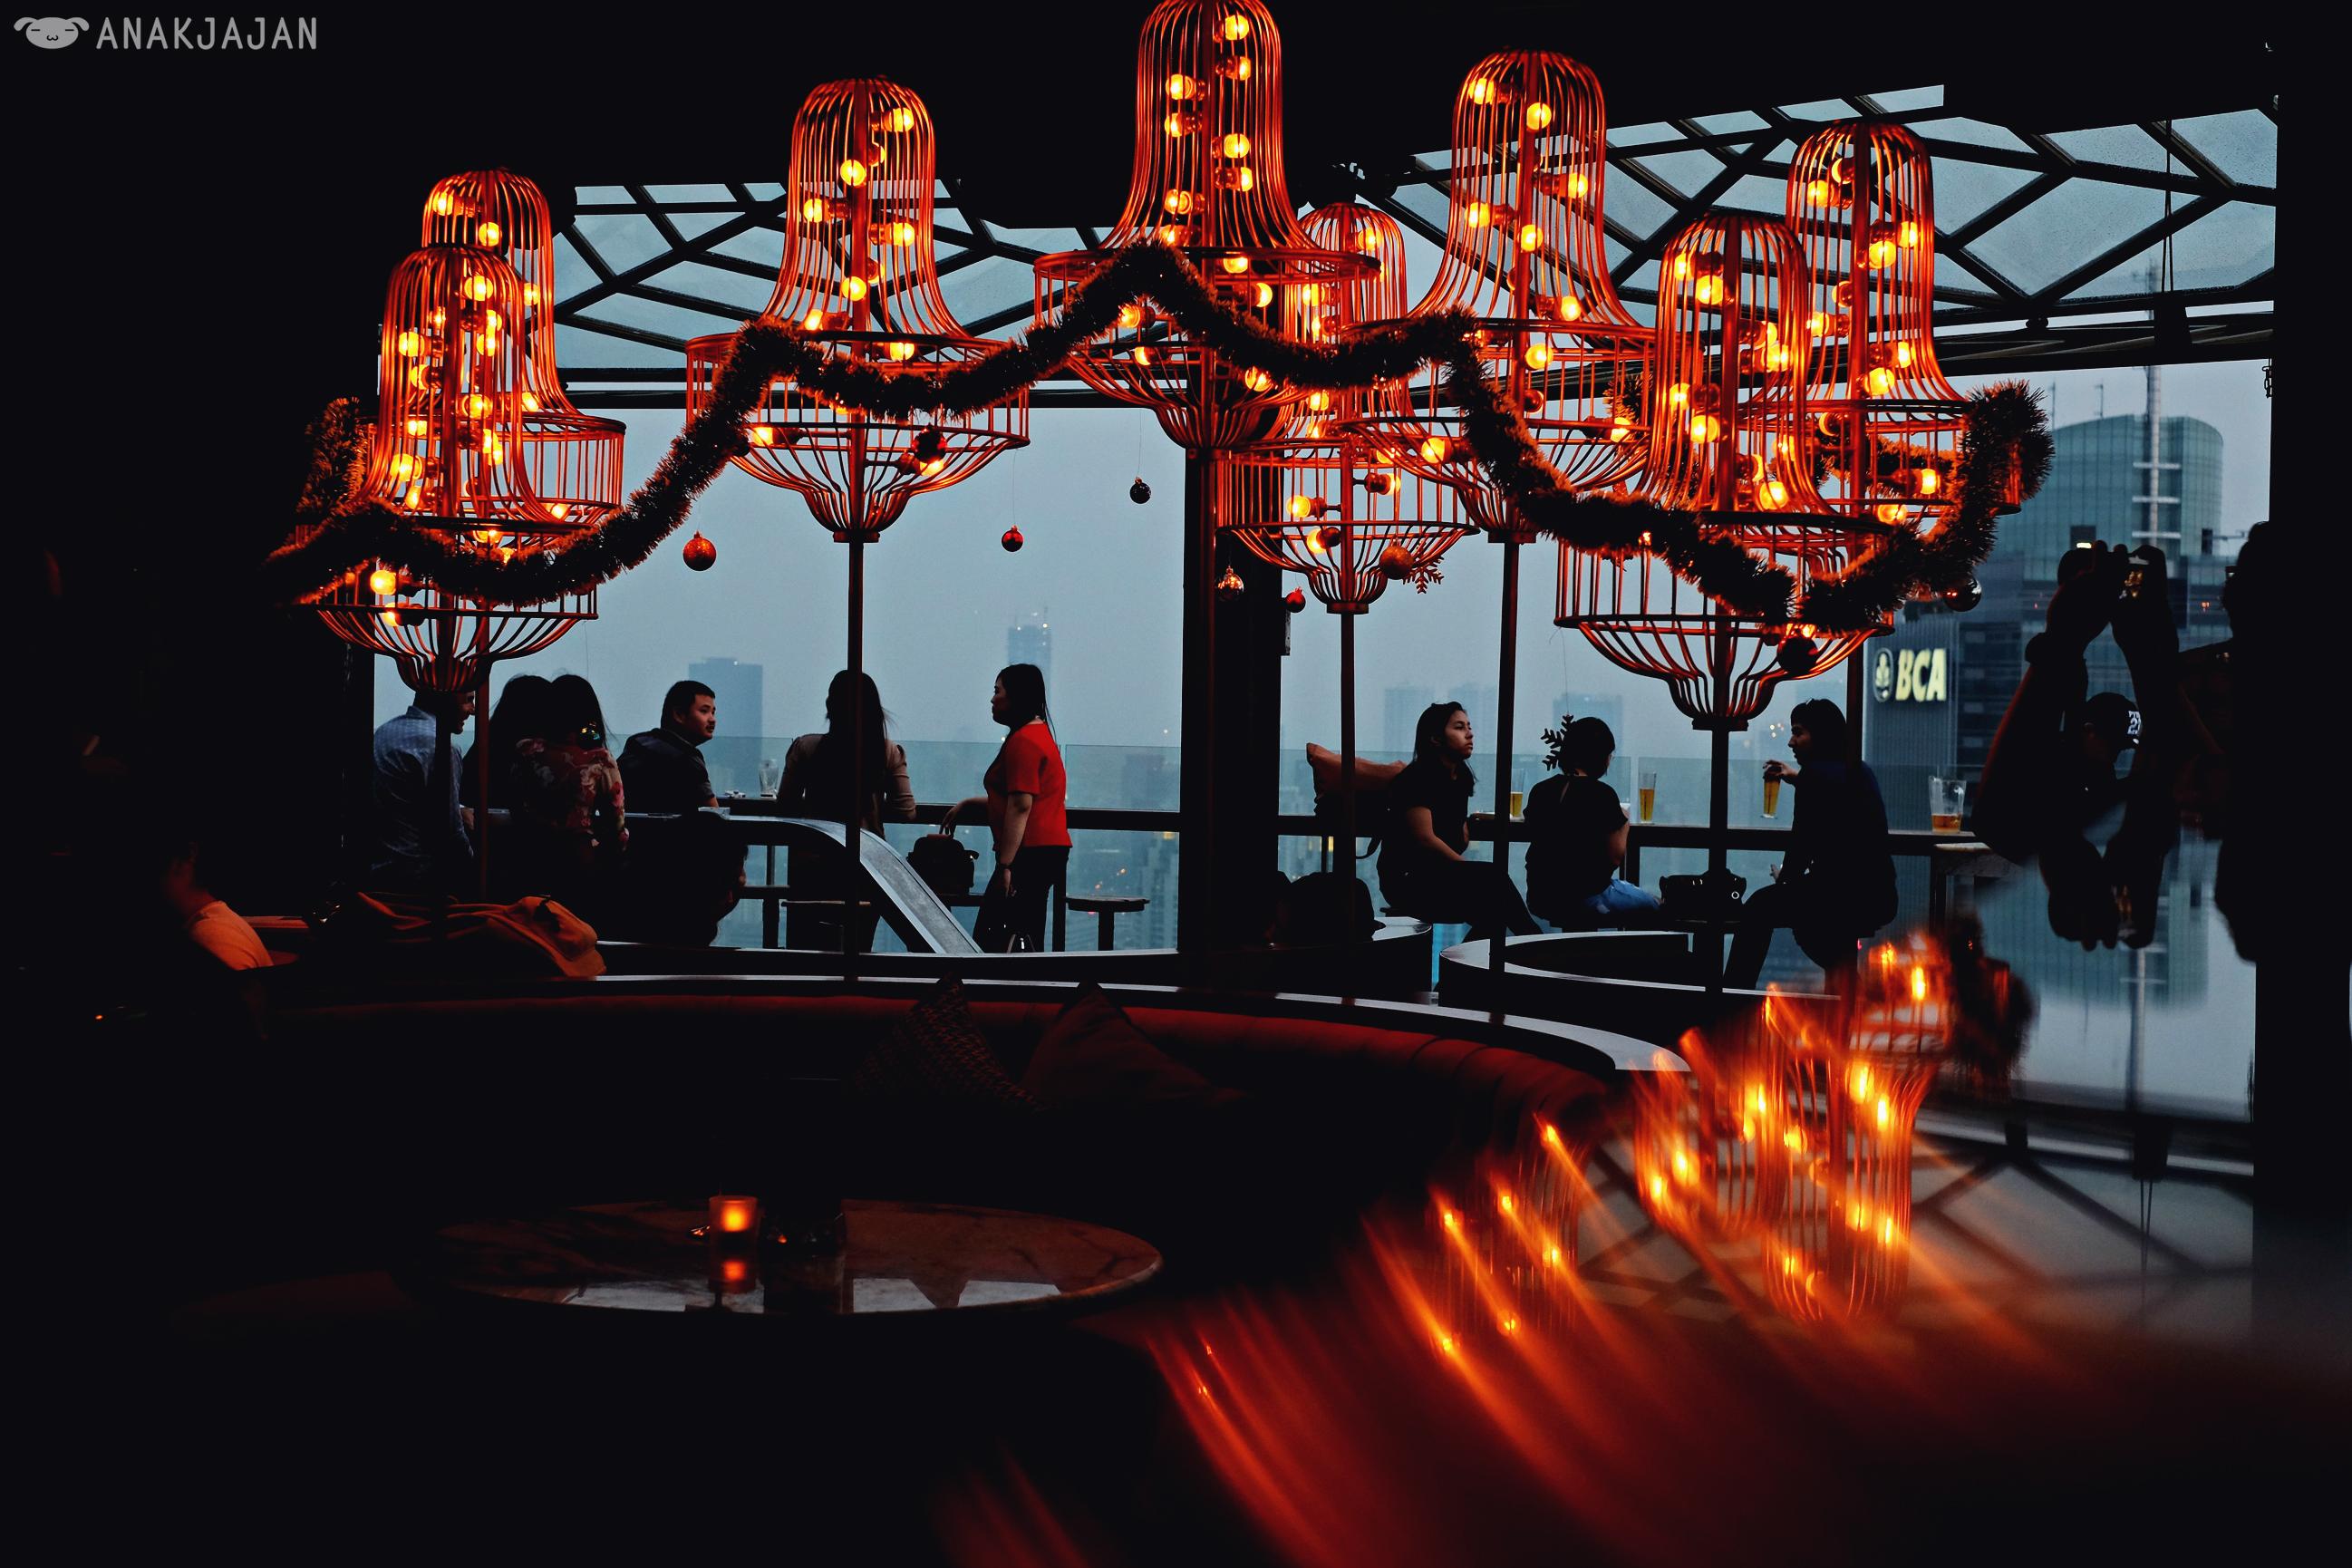 Cloud Lounge Living Room Jakarta Anakjajancom